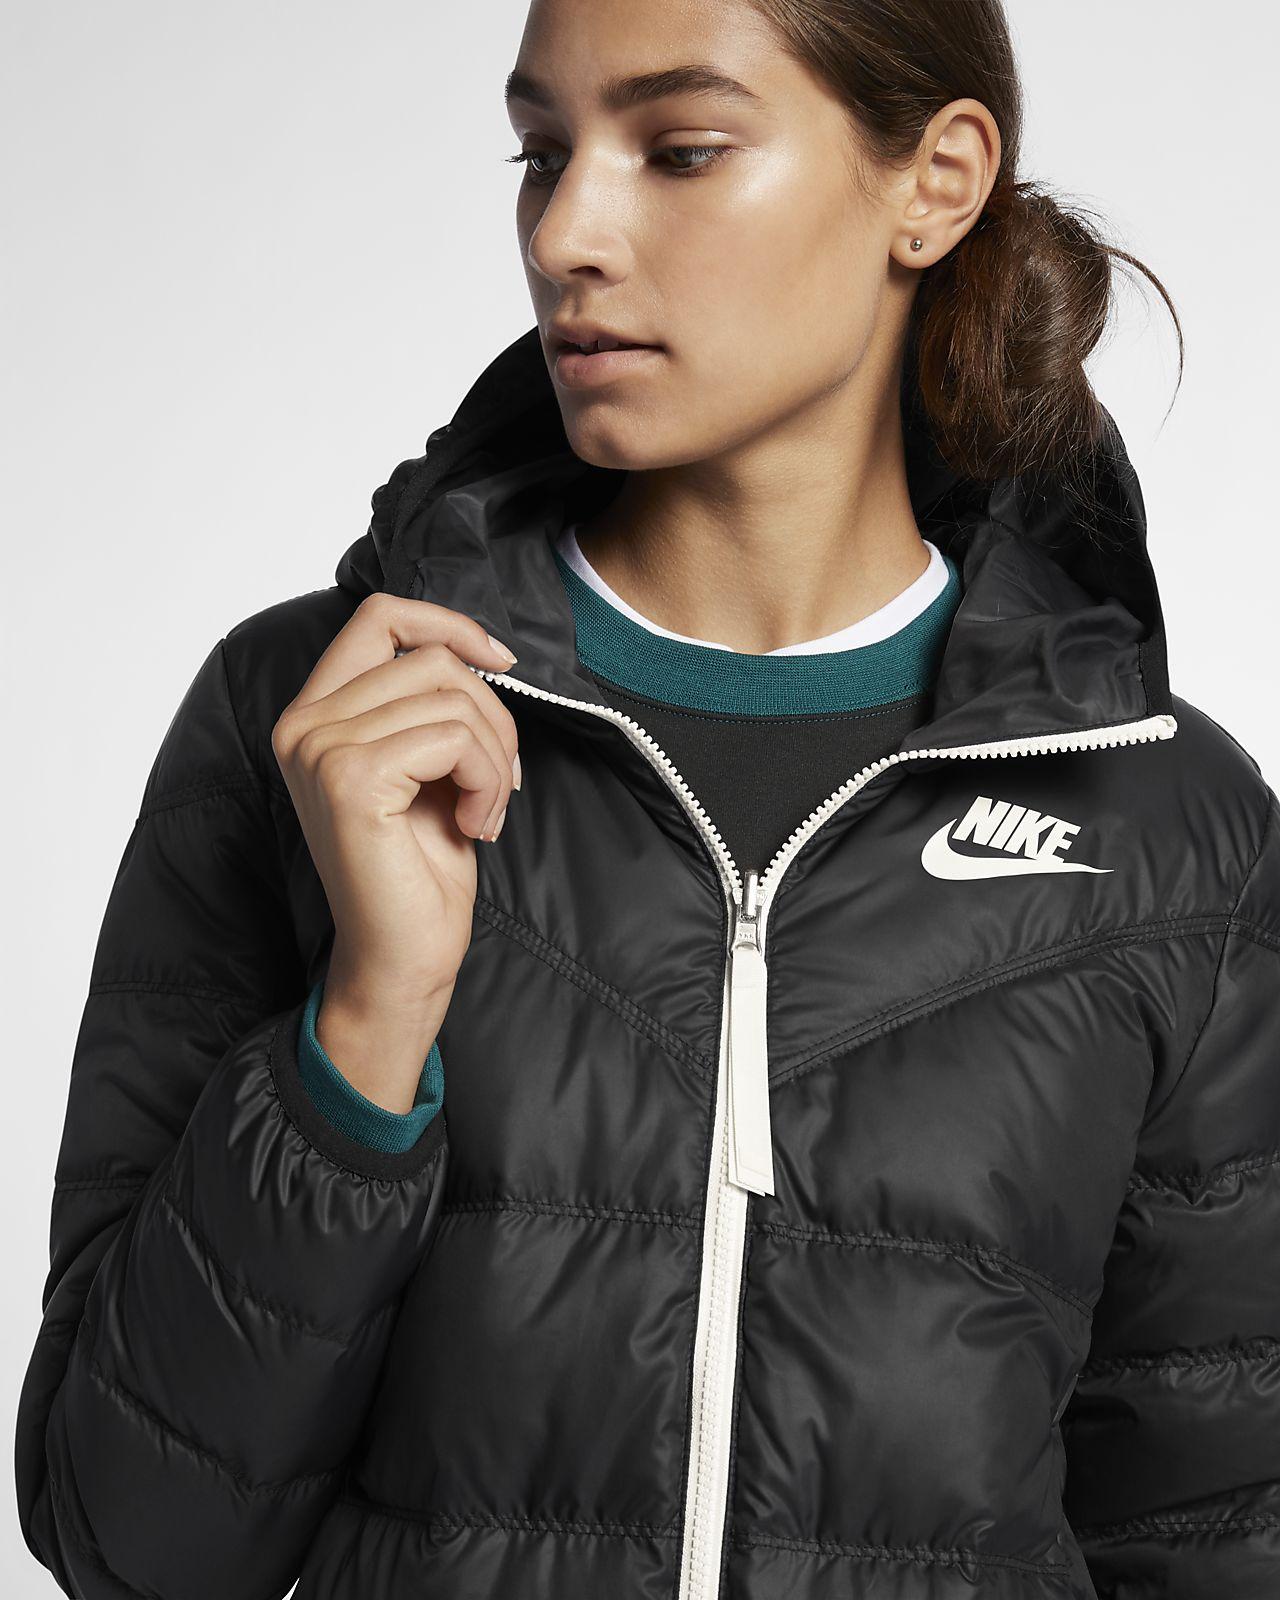 Nike Sportswear Windrunner女子双面穿羽绒夹克